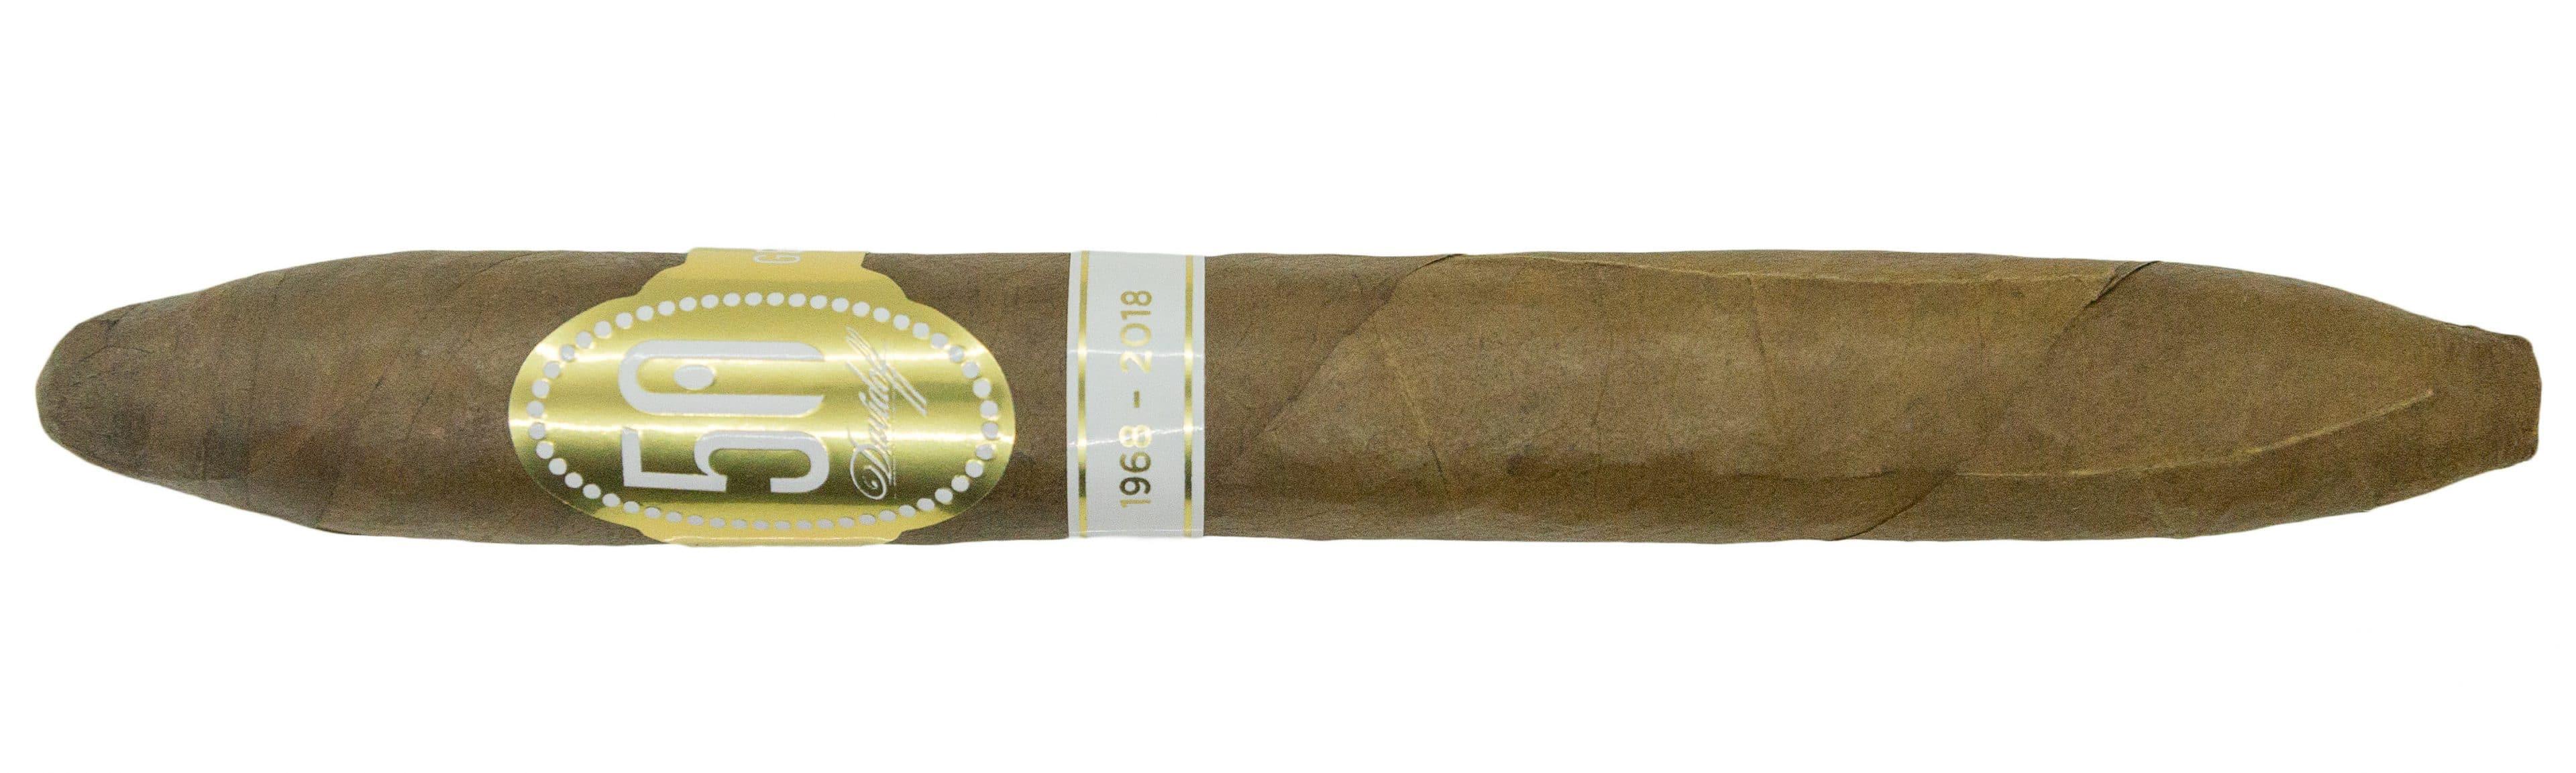 Blind Cigar Review: Davidoff   Diademas Finas